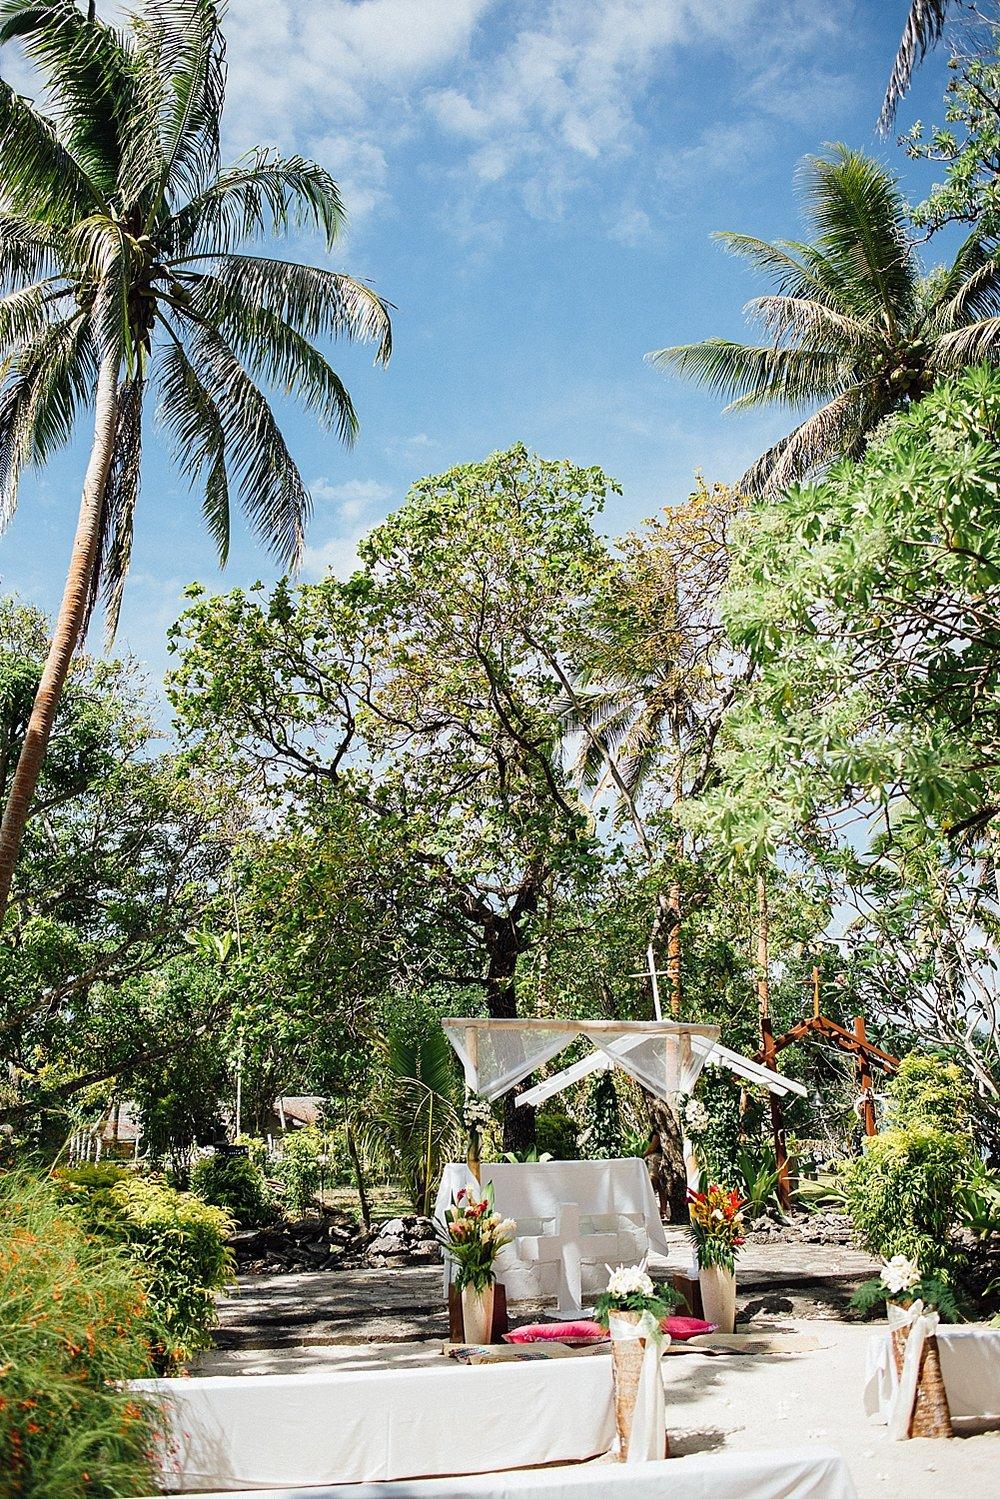 Lita-Peter-WeddingPhotography-ErakorIsland-GroovyBanana-VanuatuPhotographers_0003.jpg